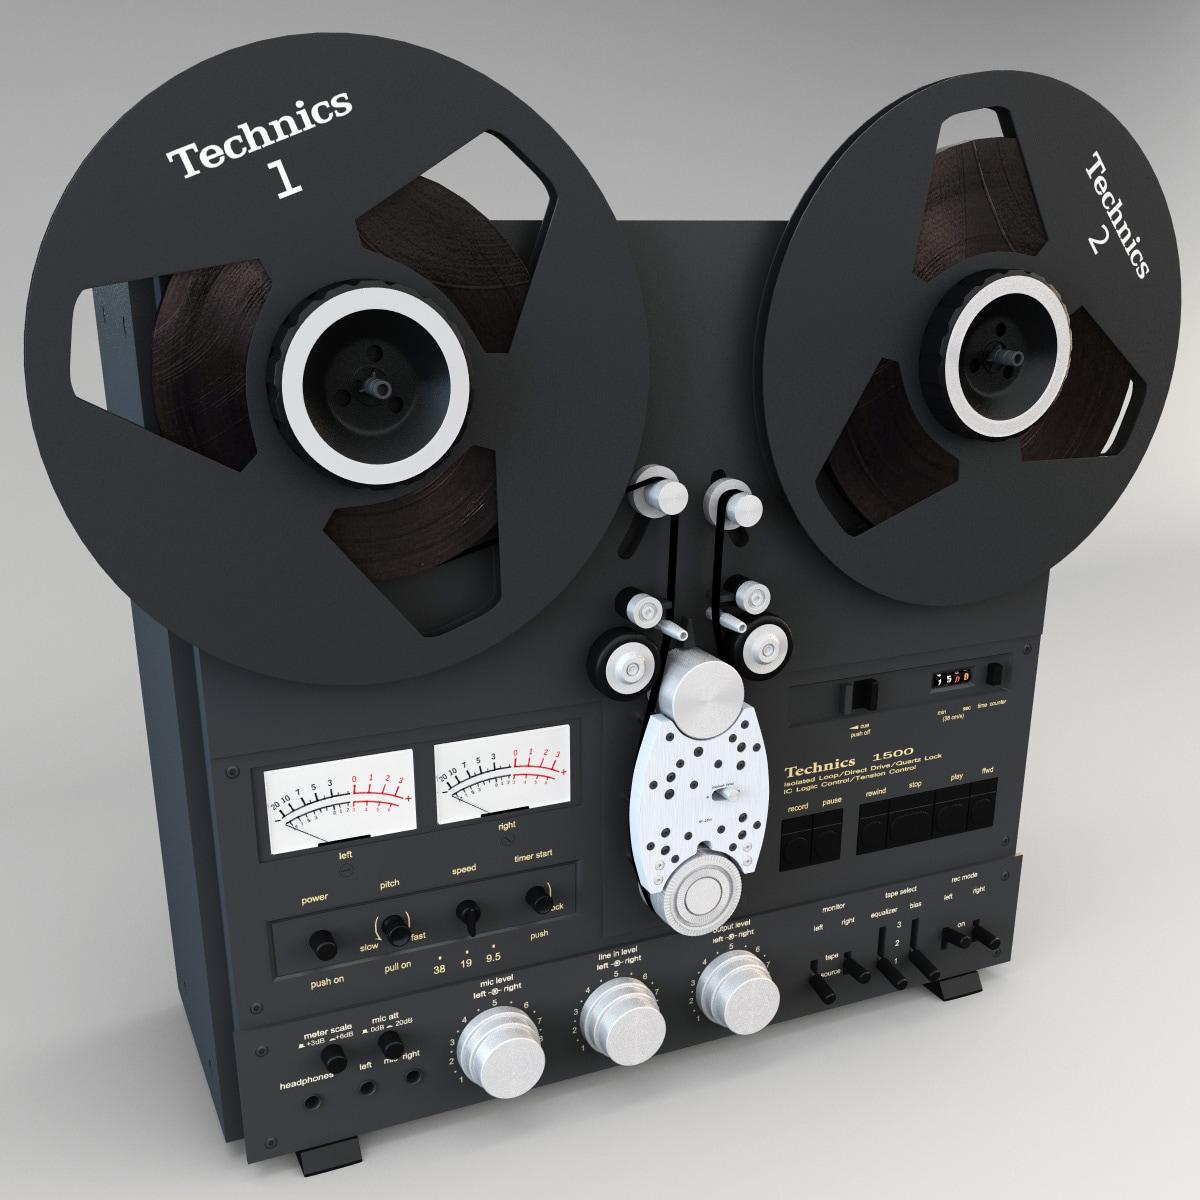 Technics_RS-1500_001.jpg